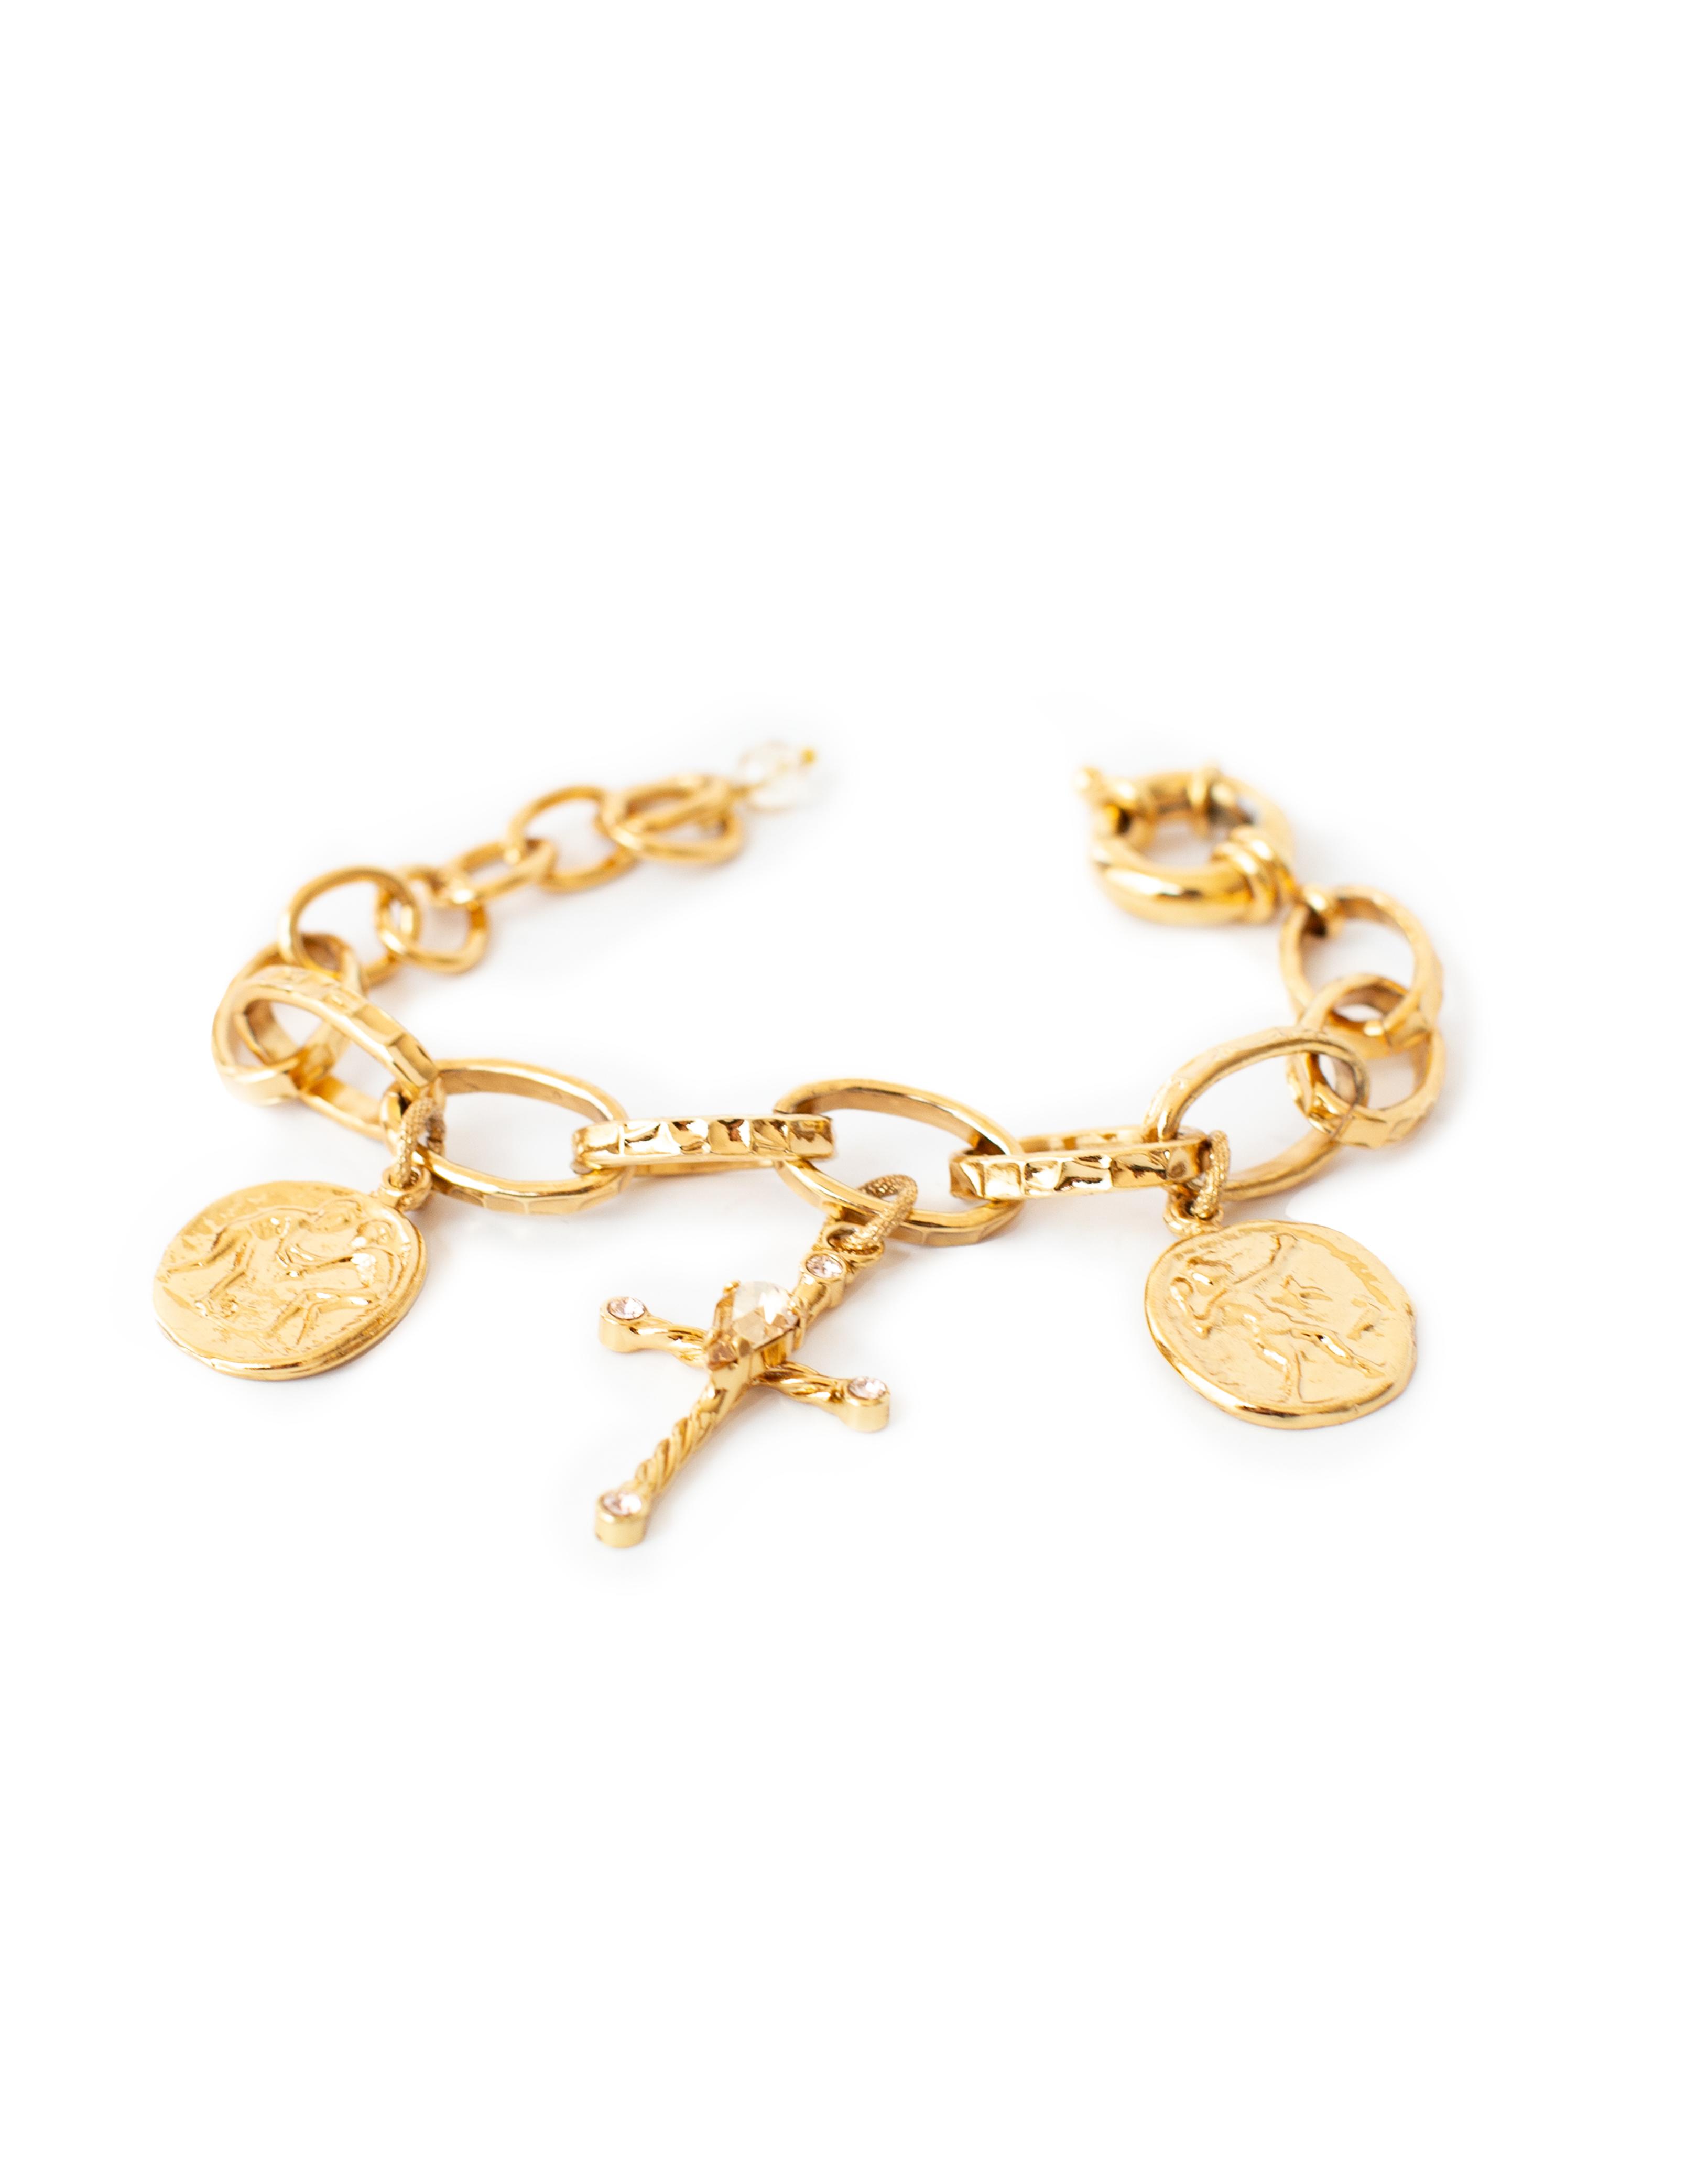 Brass LACCIO bracelet